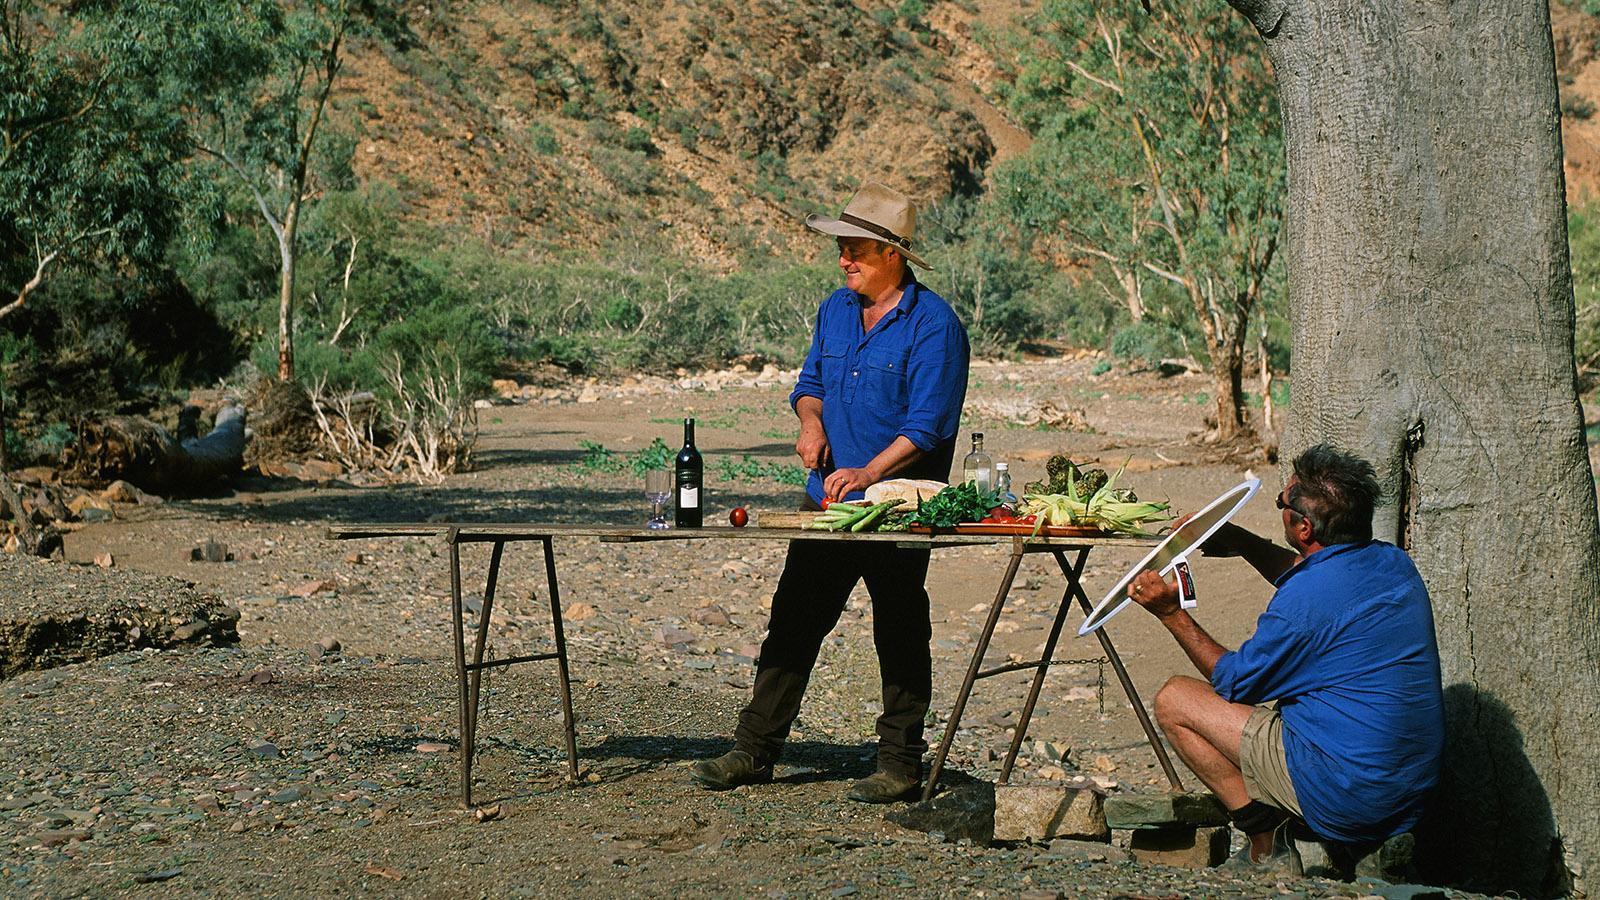 Südaustralien: Foto-Session mit TV-Koch Andrew Dwyer in der Parachilna Gorge. Foto: Hilke Maunder